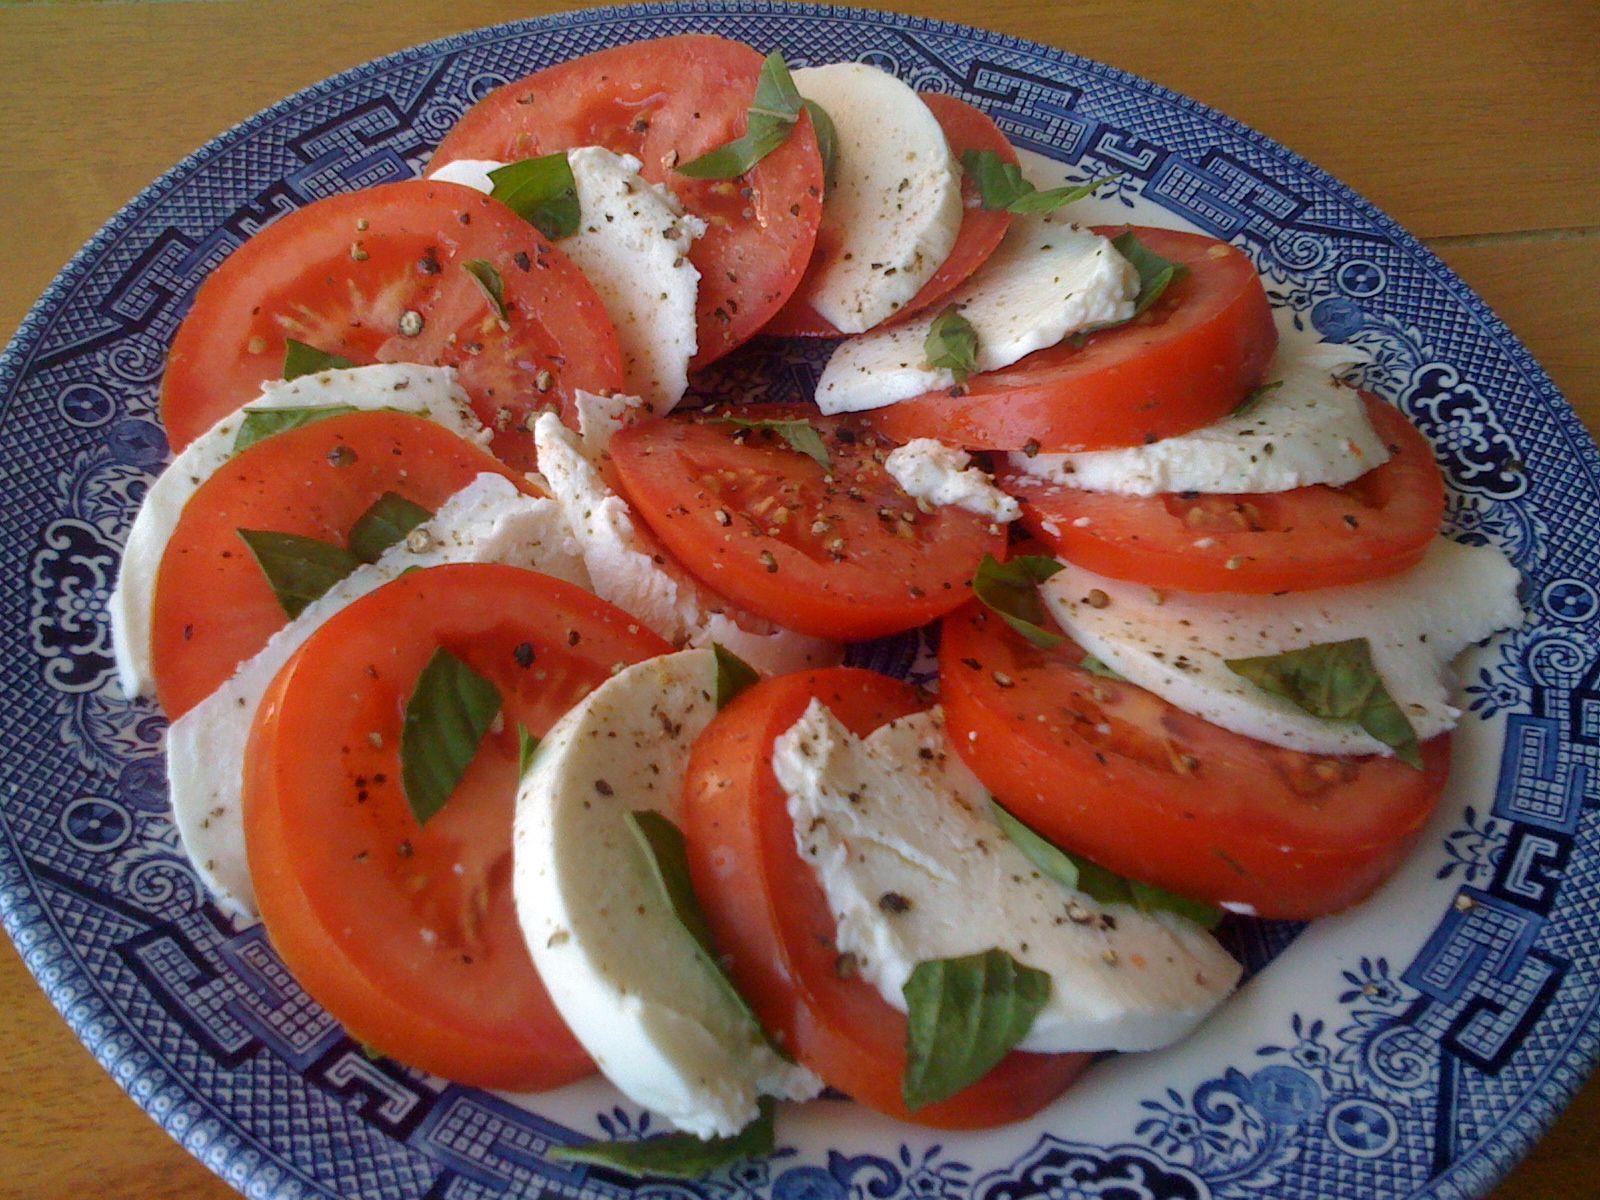 another way to do caprese salad! tomato. basil. mozzarella. black pepper. olive oil & vinaigrette. YUMMYY!!!!